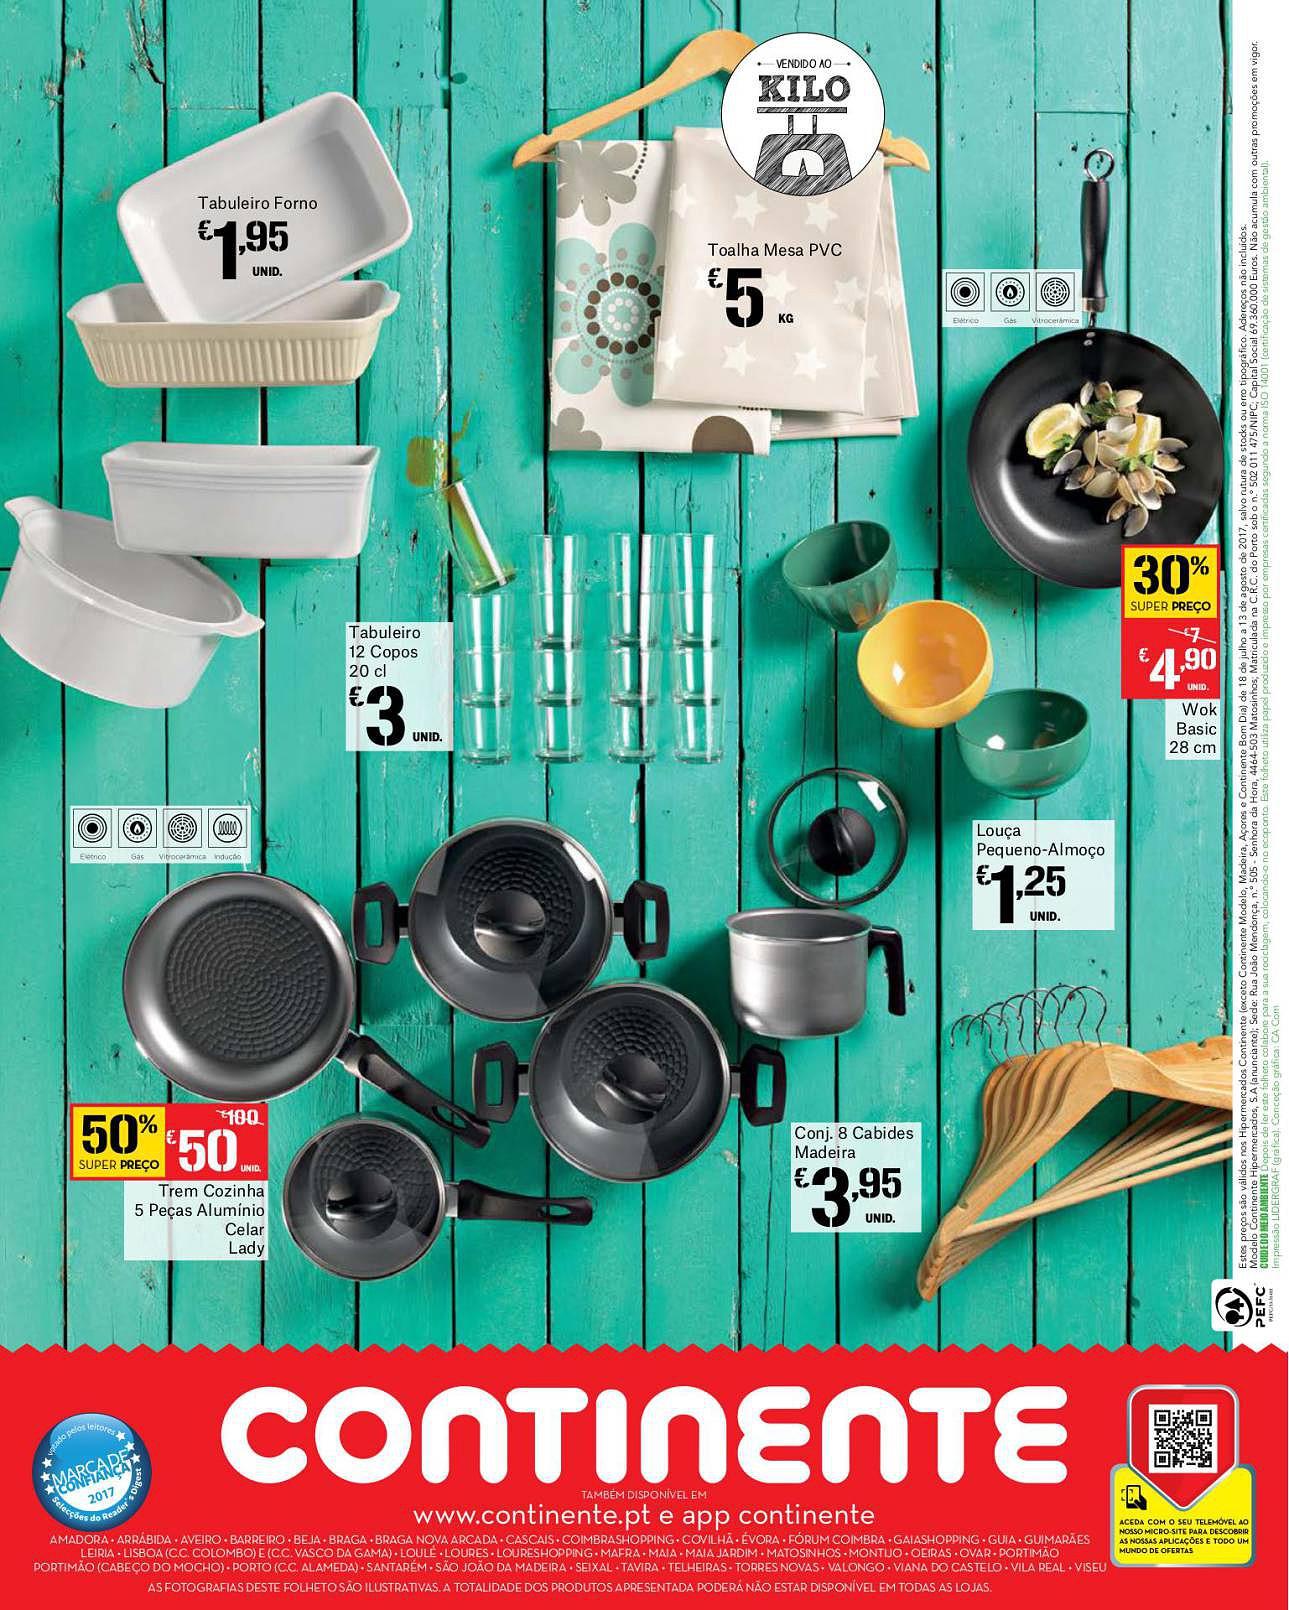 promocoes-continente-antevisao-folheto-decoracao-20.jpg